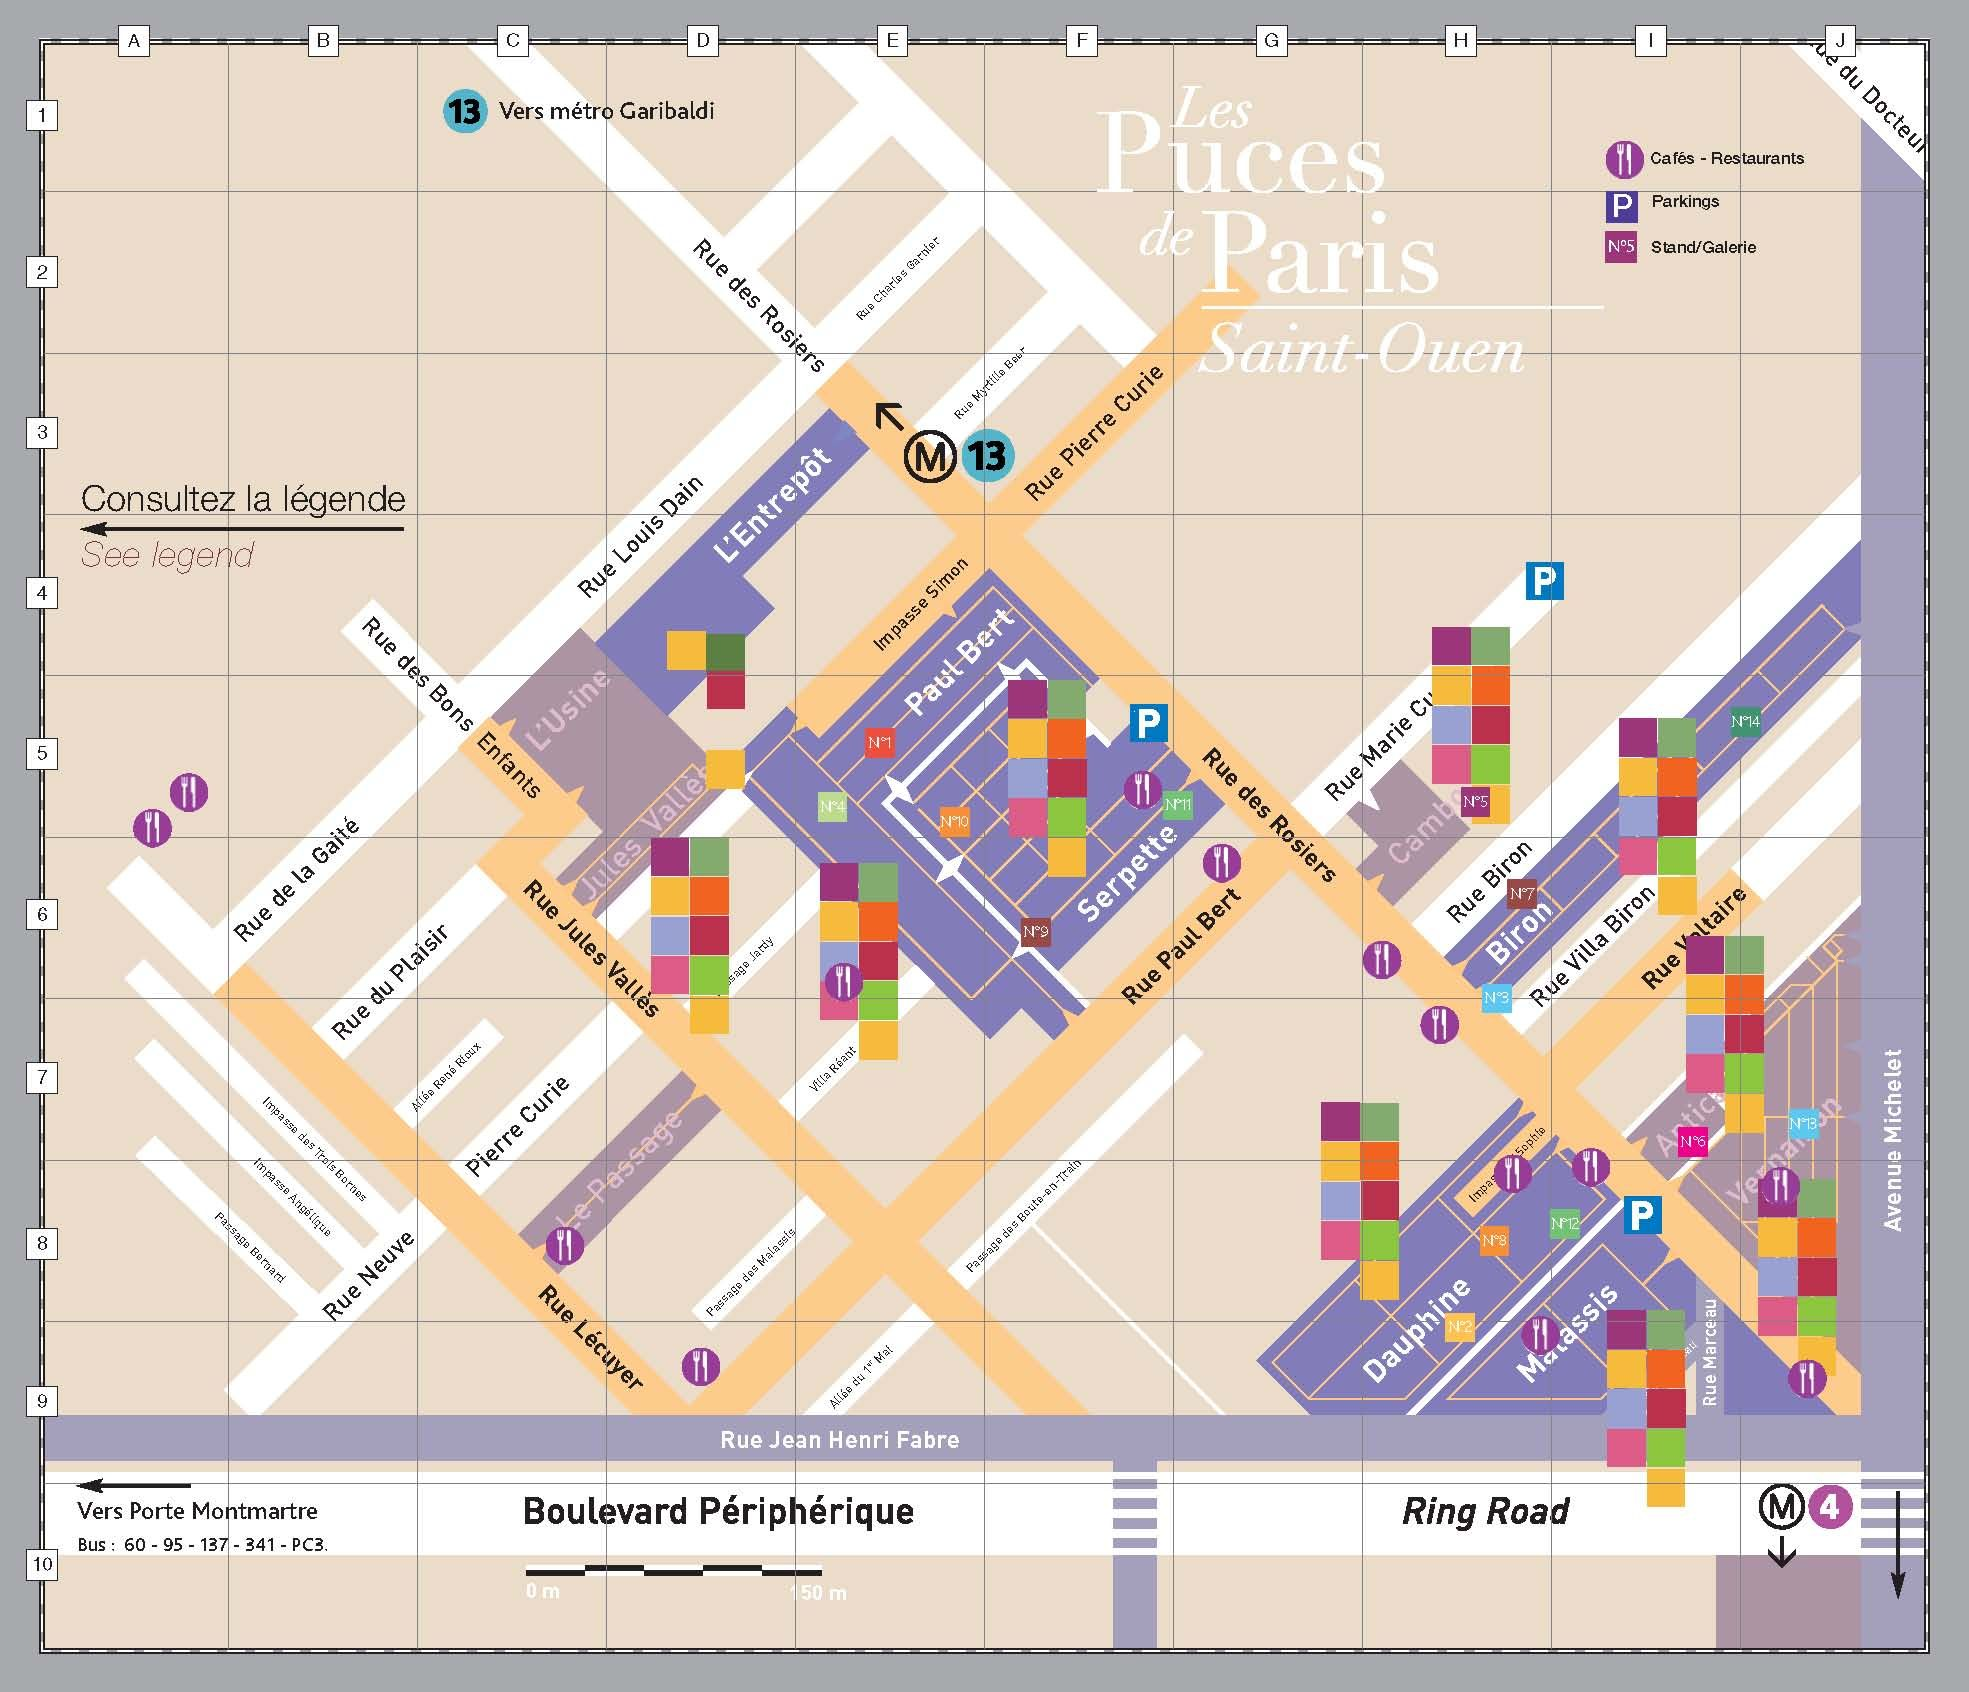 Map of Paris Flea Markets